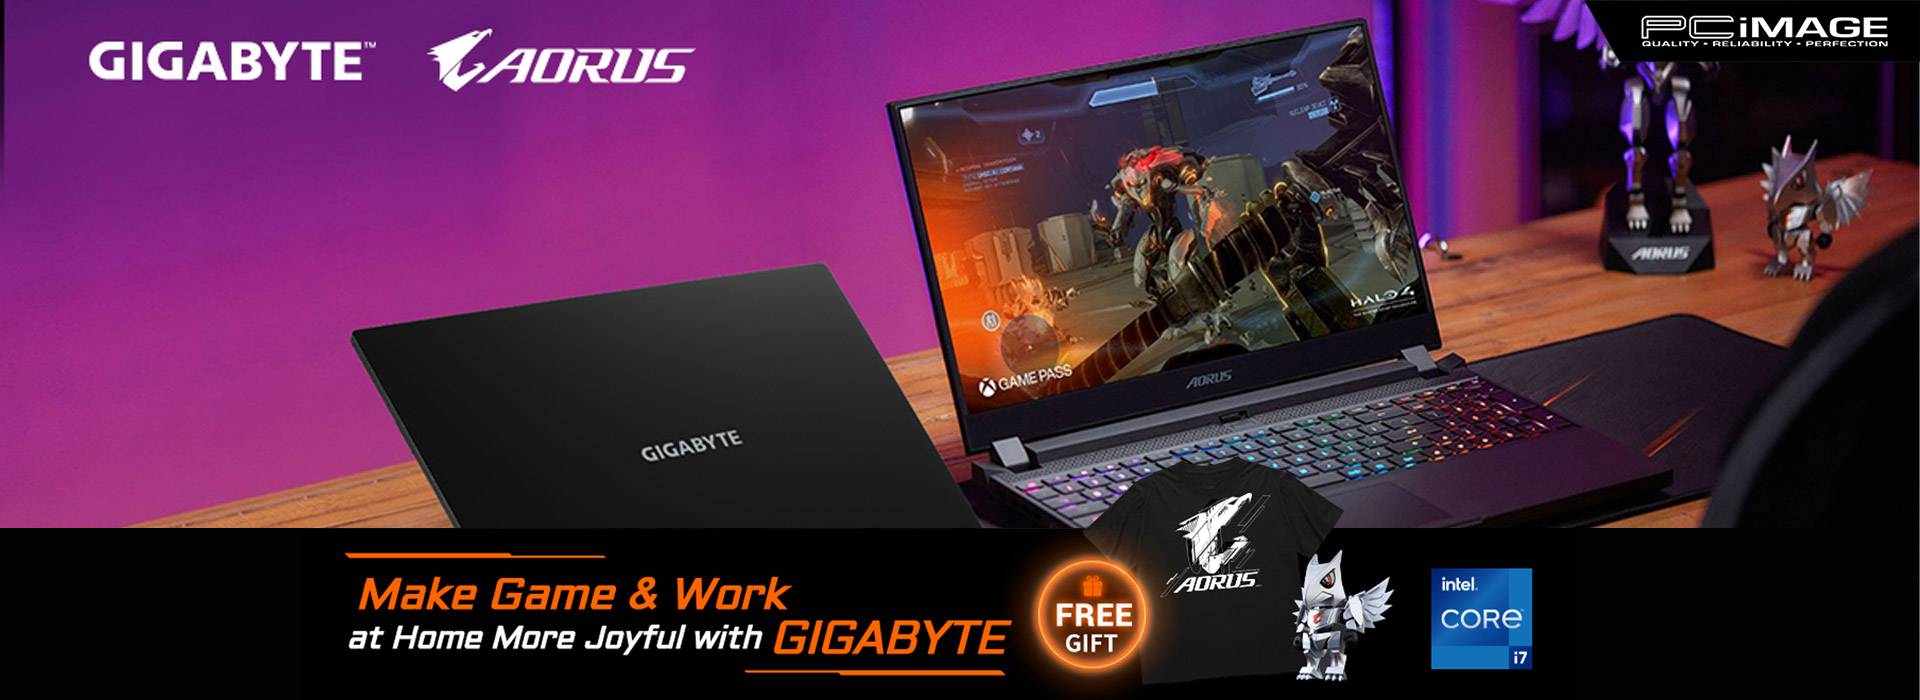 Make Game & Work at Home More Joyful with GIGABYTE